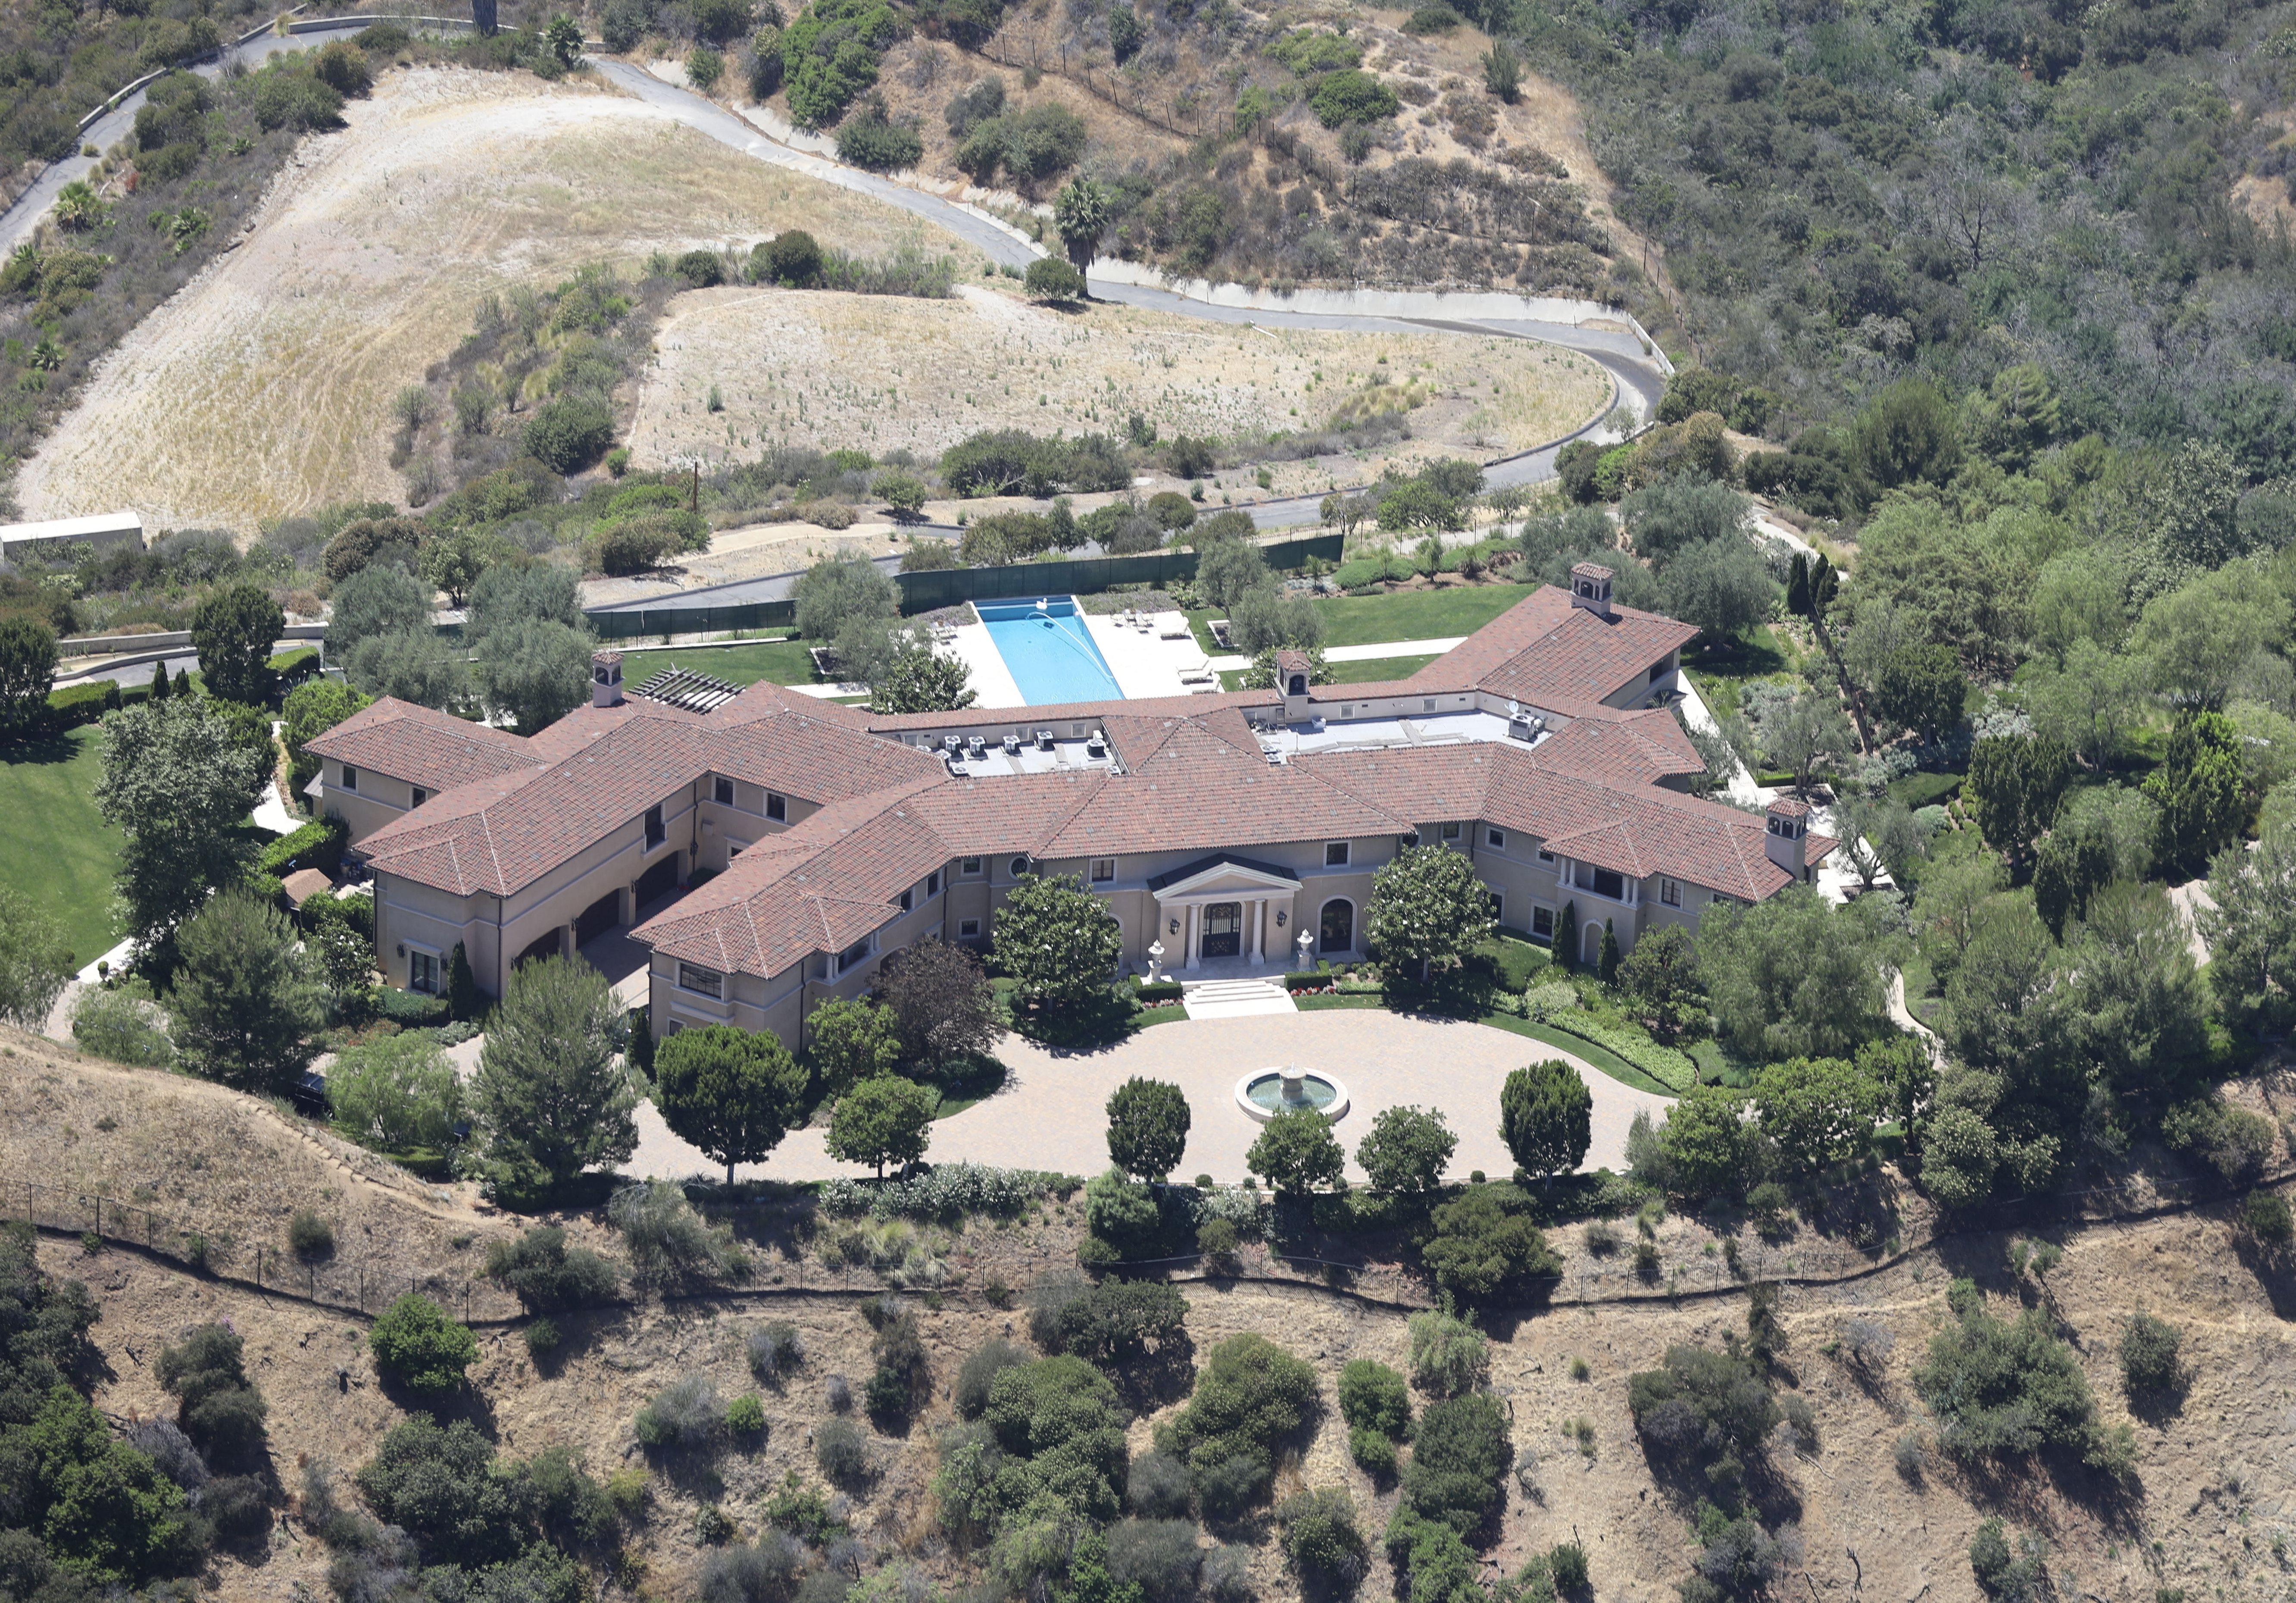 Maison Meghan Markle et Prince Harry Santa Barbara